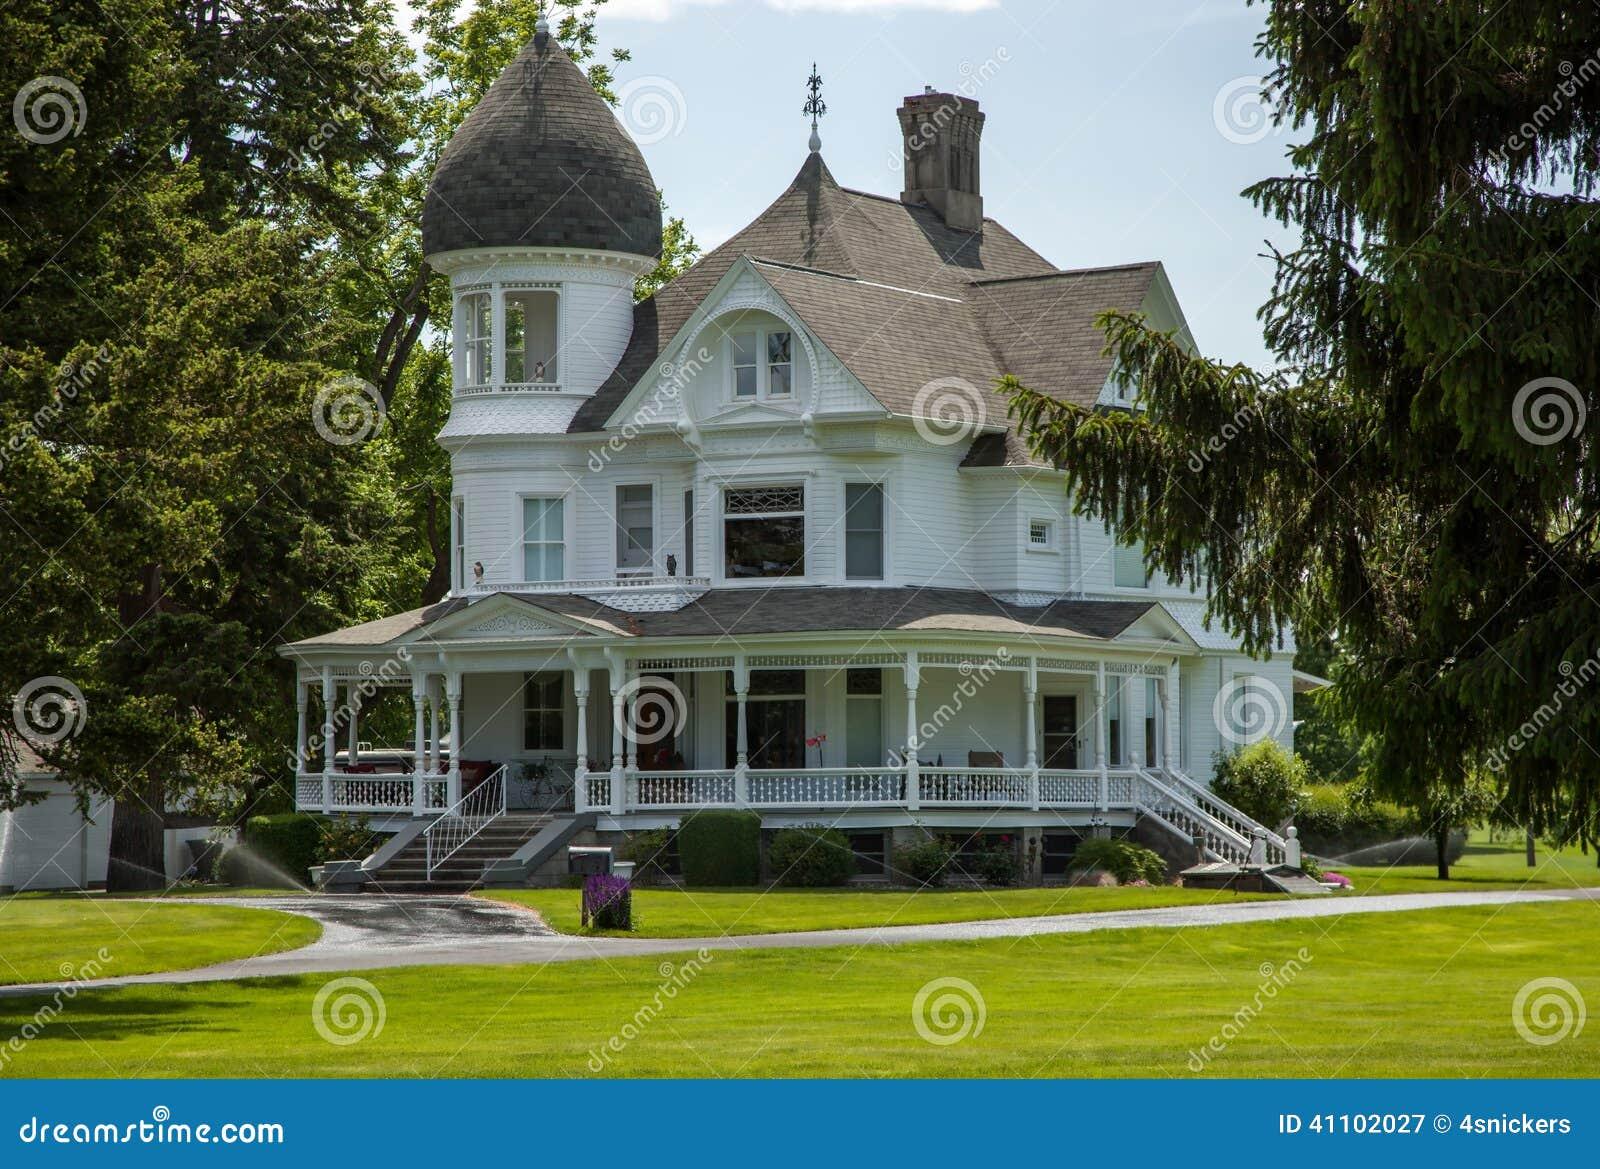 Classic White Victorian Home Stock Photo - Image: 41102027